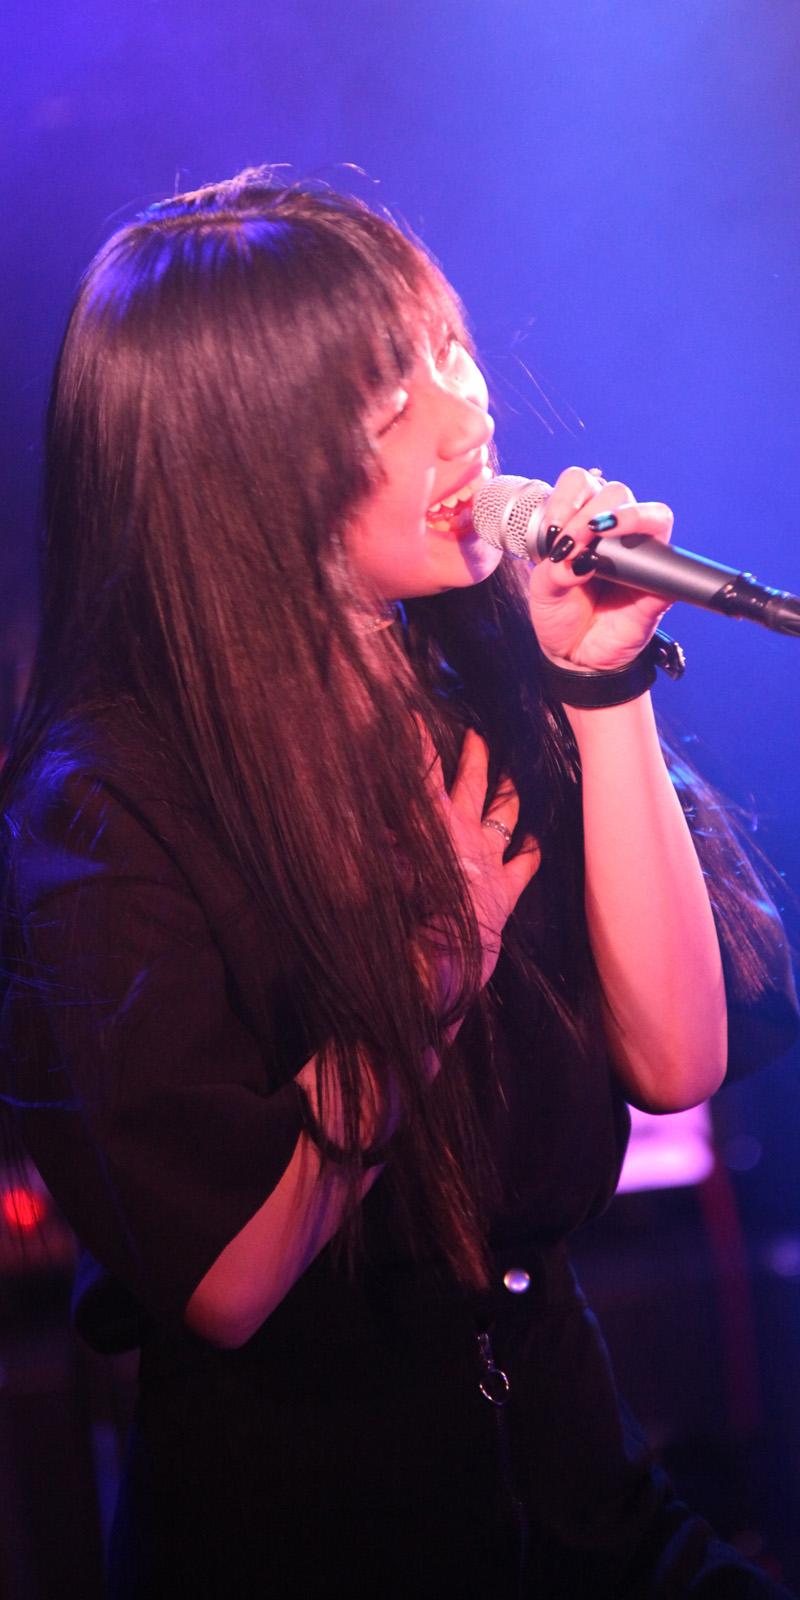 RMMS-BRATS-Live-2017-03-29-Rei-vocals-188